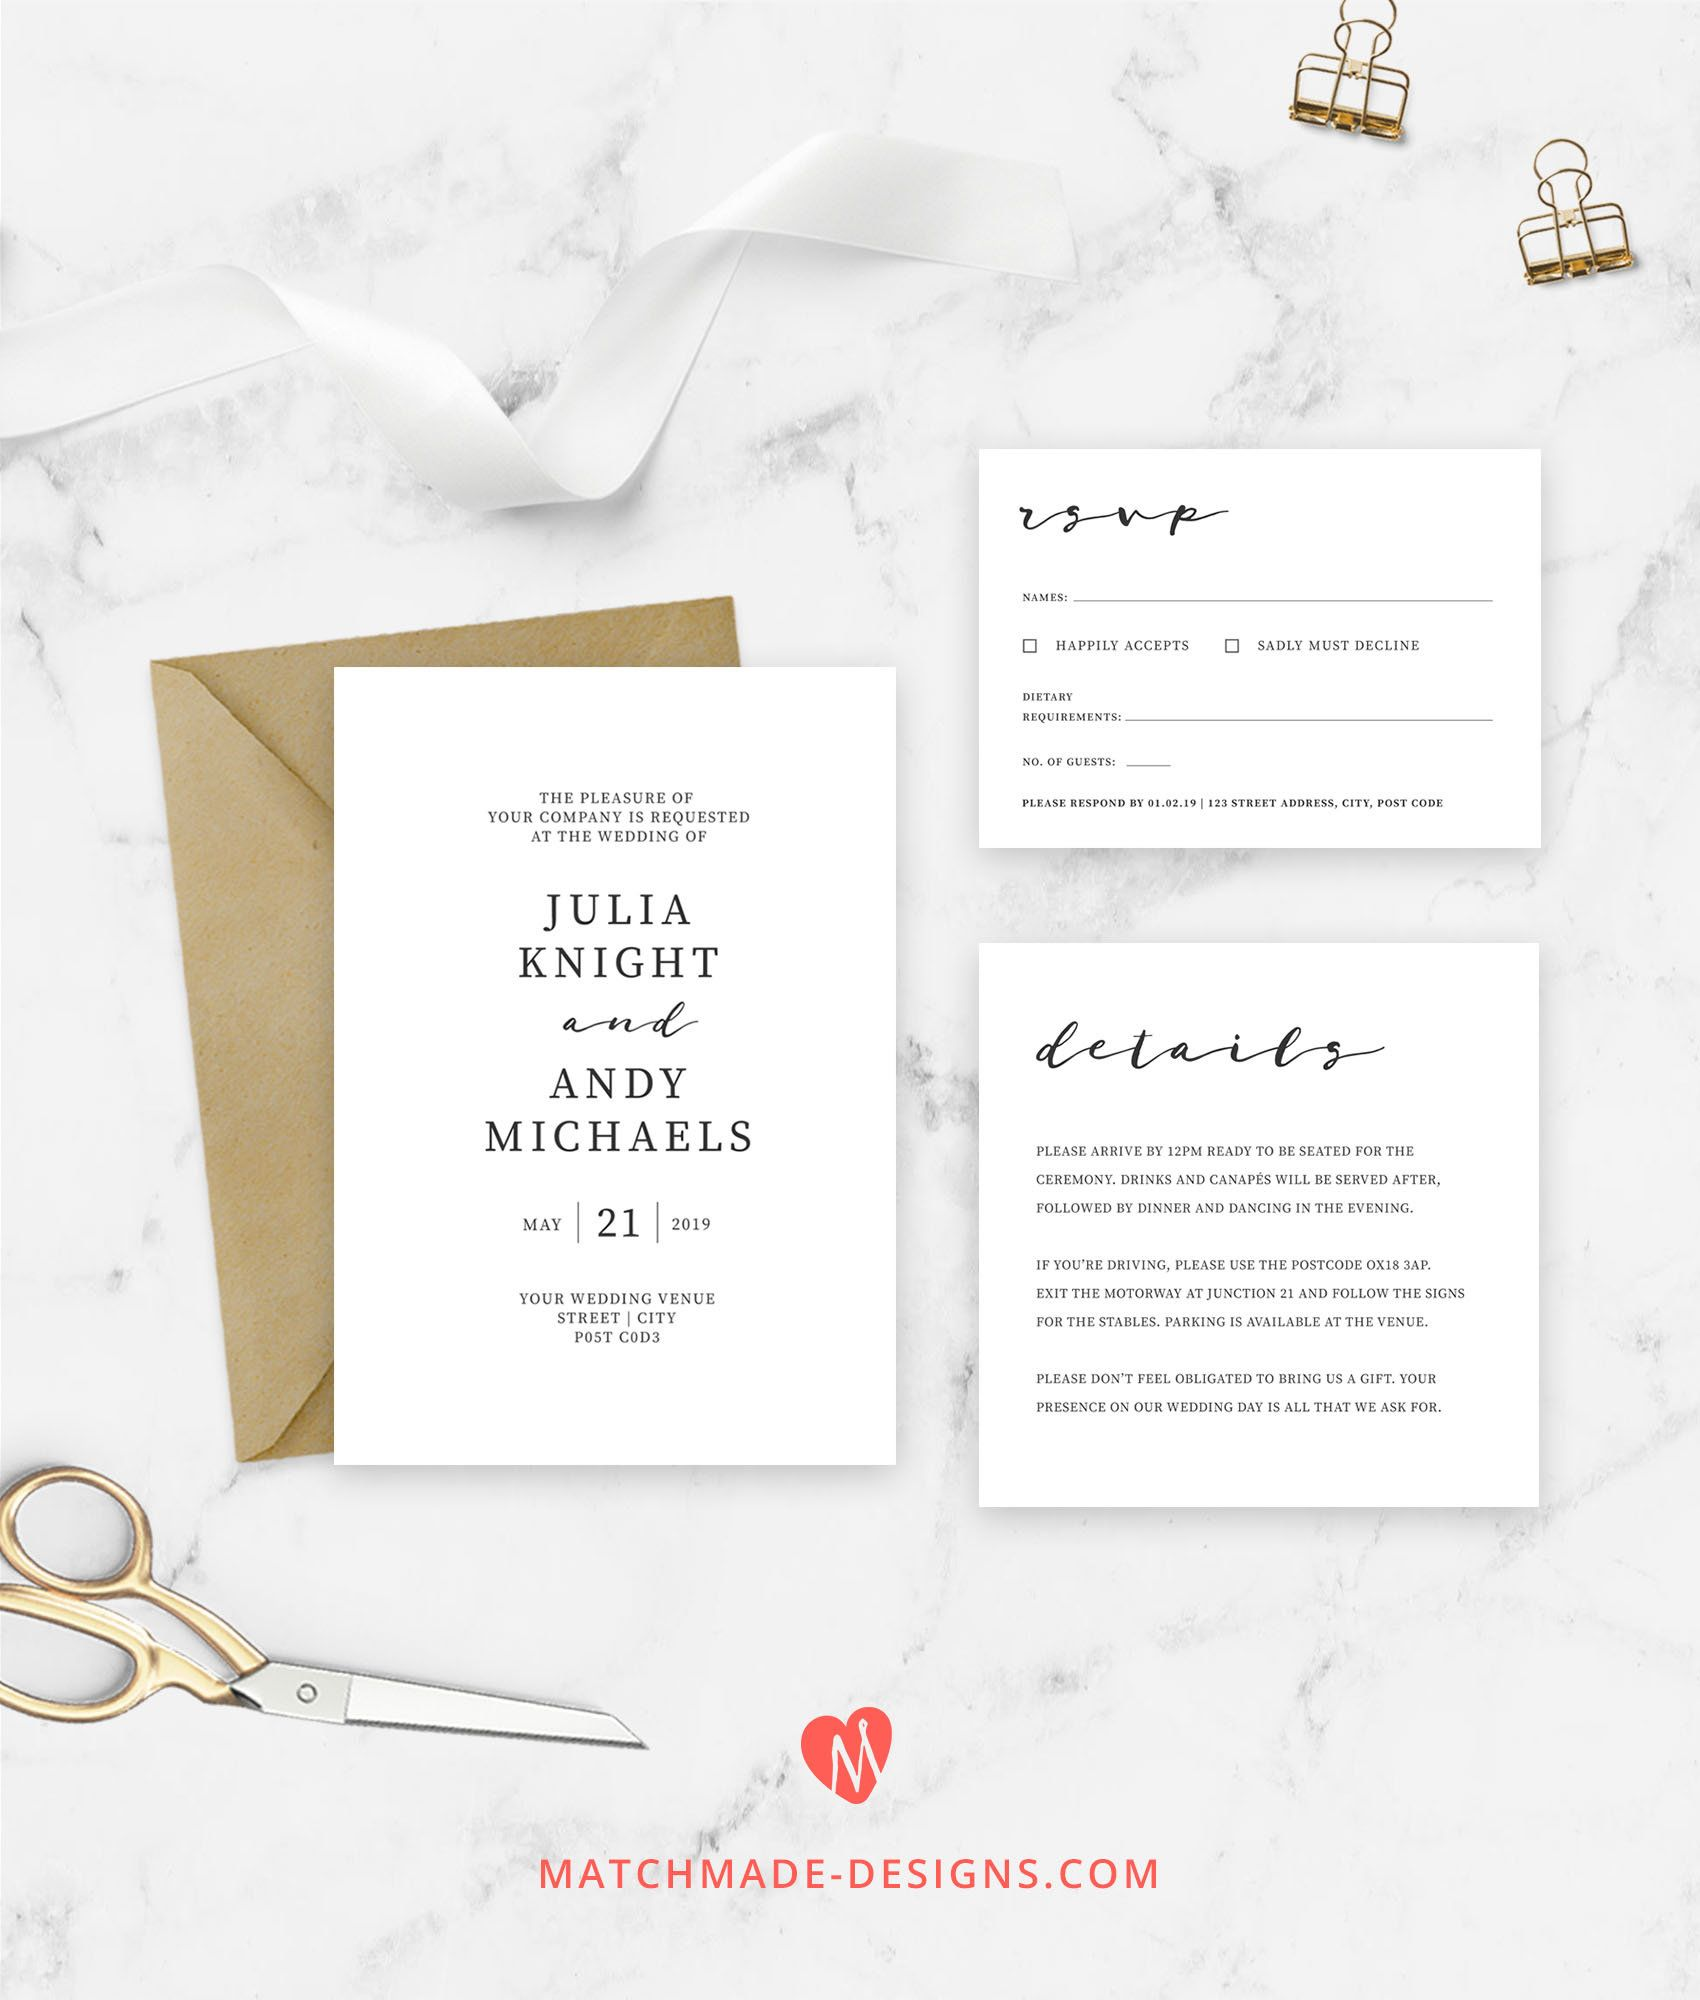 modern wedding invite Save the Date edit online Corjl editable online URBAN MINIMALIST \u2013 spring wedding invitation template TWO-W453